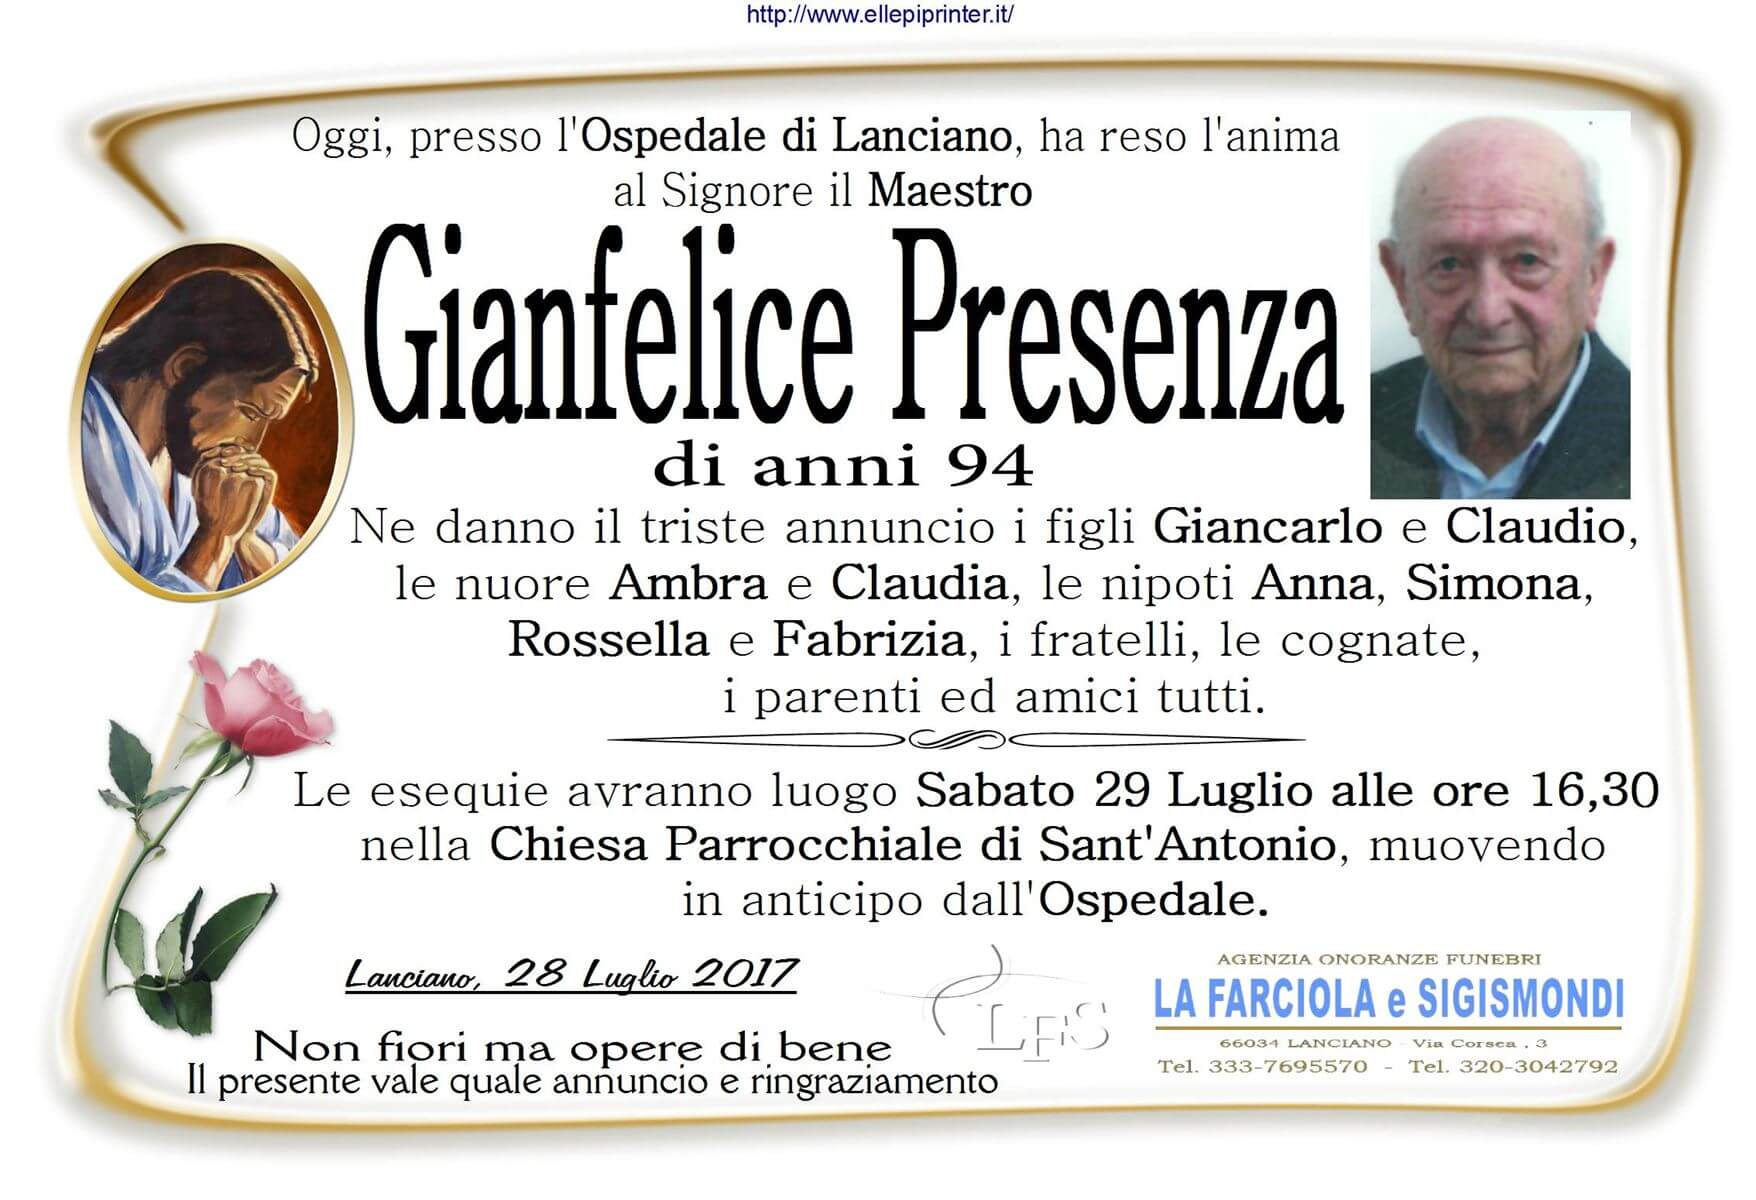 Necrologio Lanciano - Gianfelice Presenza